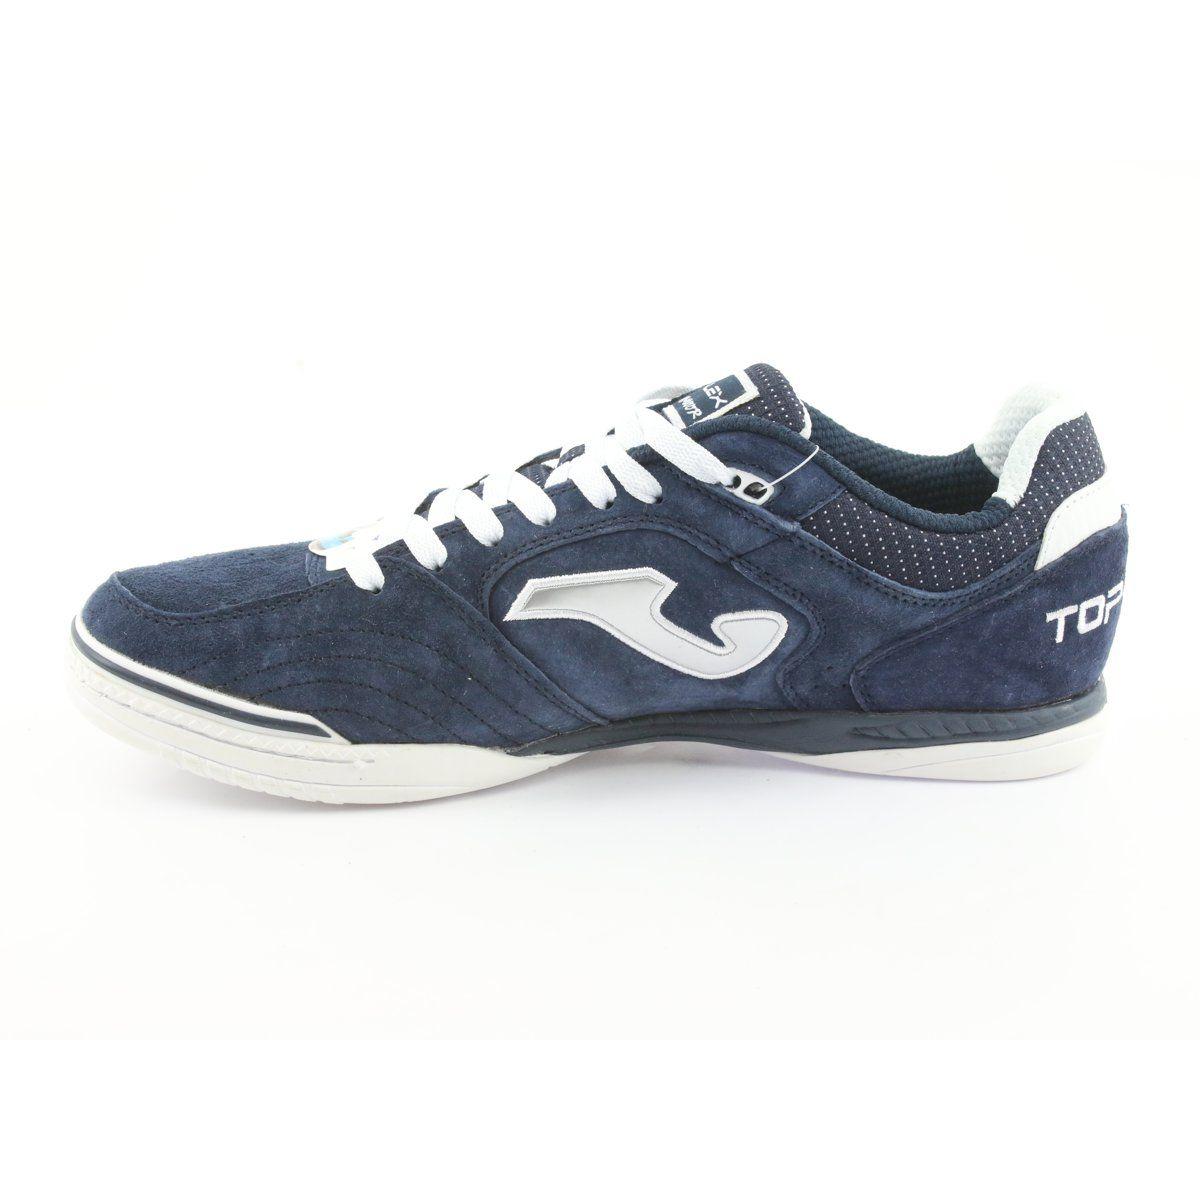 Shoes Joma Top Flex Nobuck 803 Topns 803 In Navy Shoes Joma Indoor Shoe